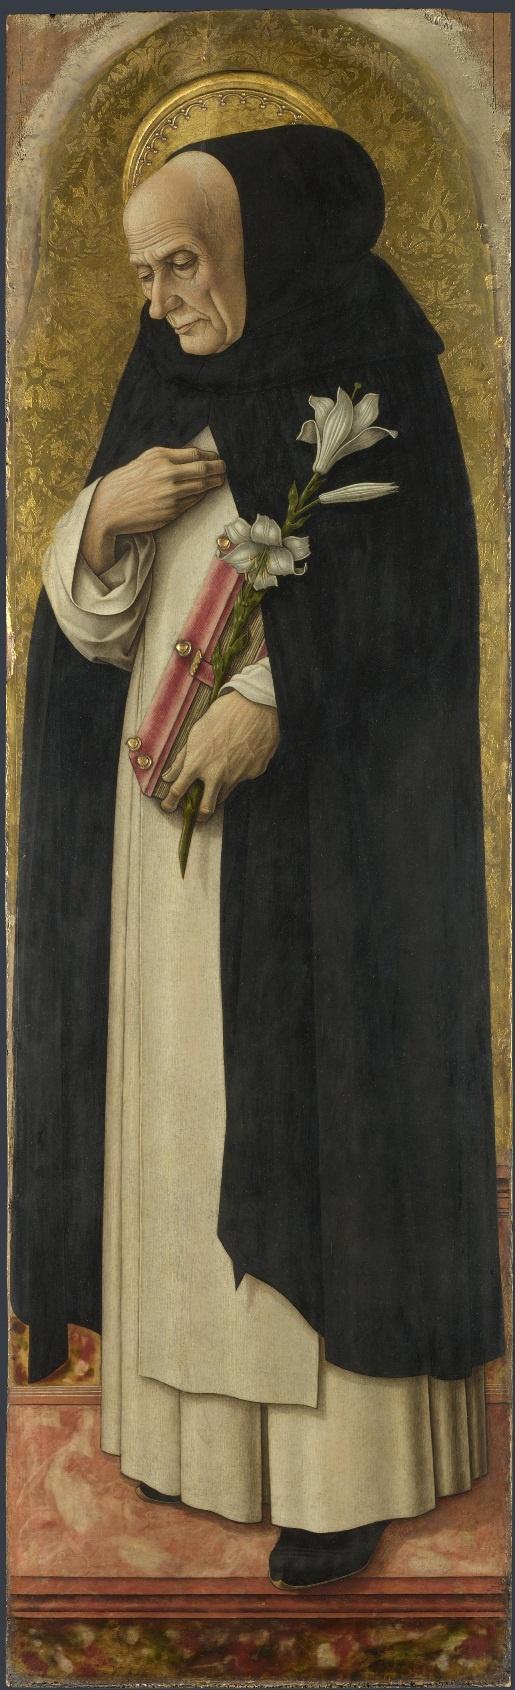 ❤ - CARLO CRIVELLI (1435 – 1495) - Polyptych of San Domenico. Saint Dominic (detail). National Gallery, London.